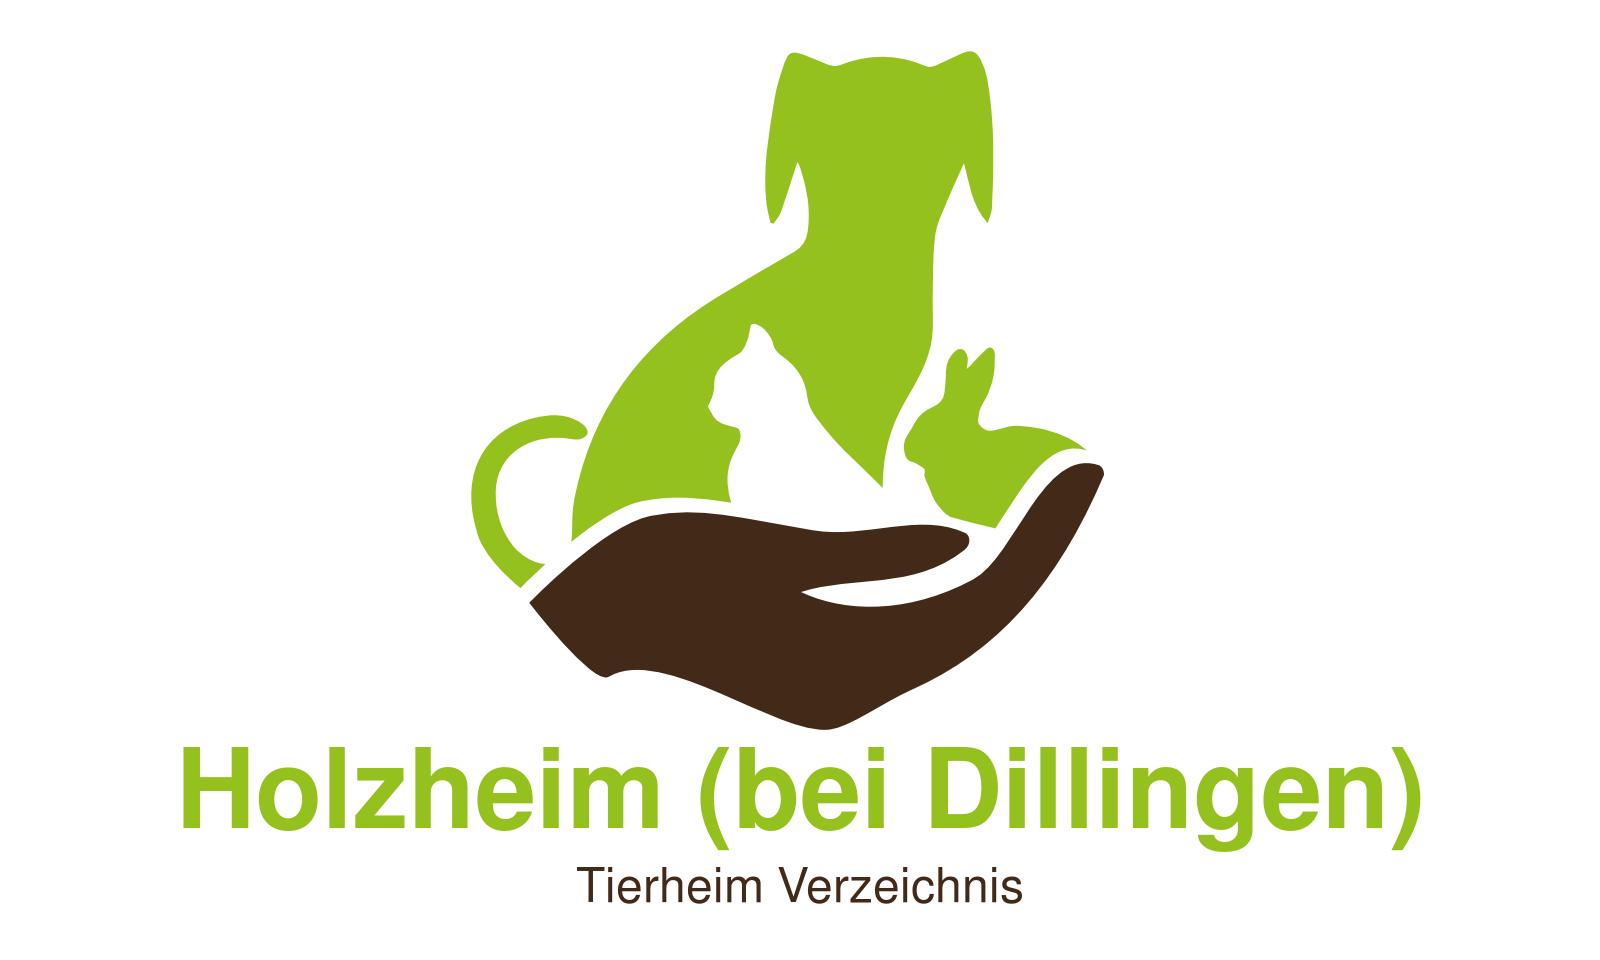 Tierheim Holzheim (bei Dillingen)